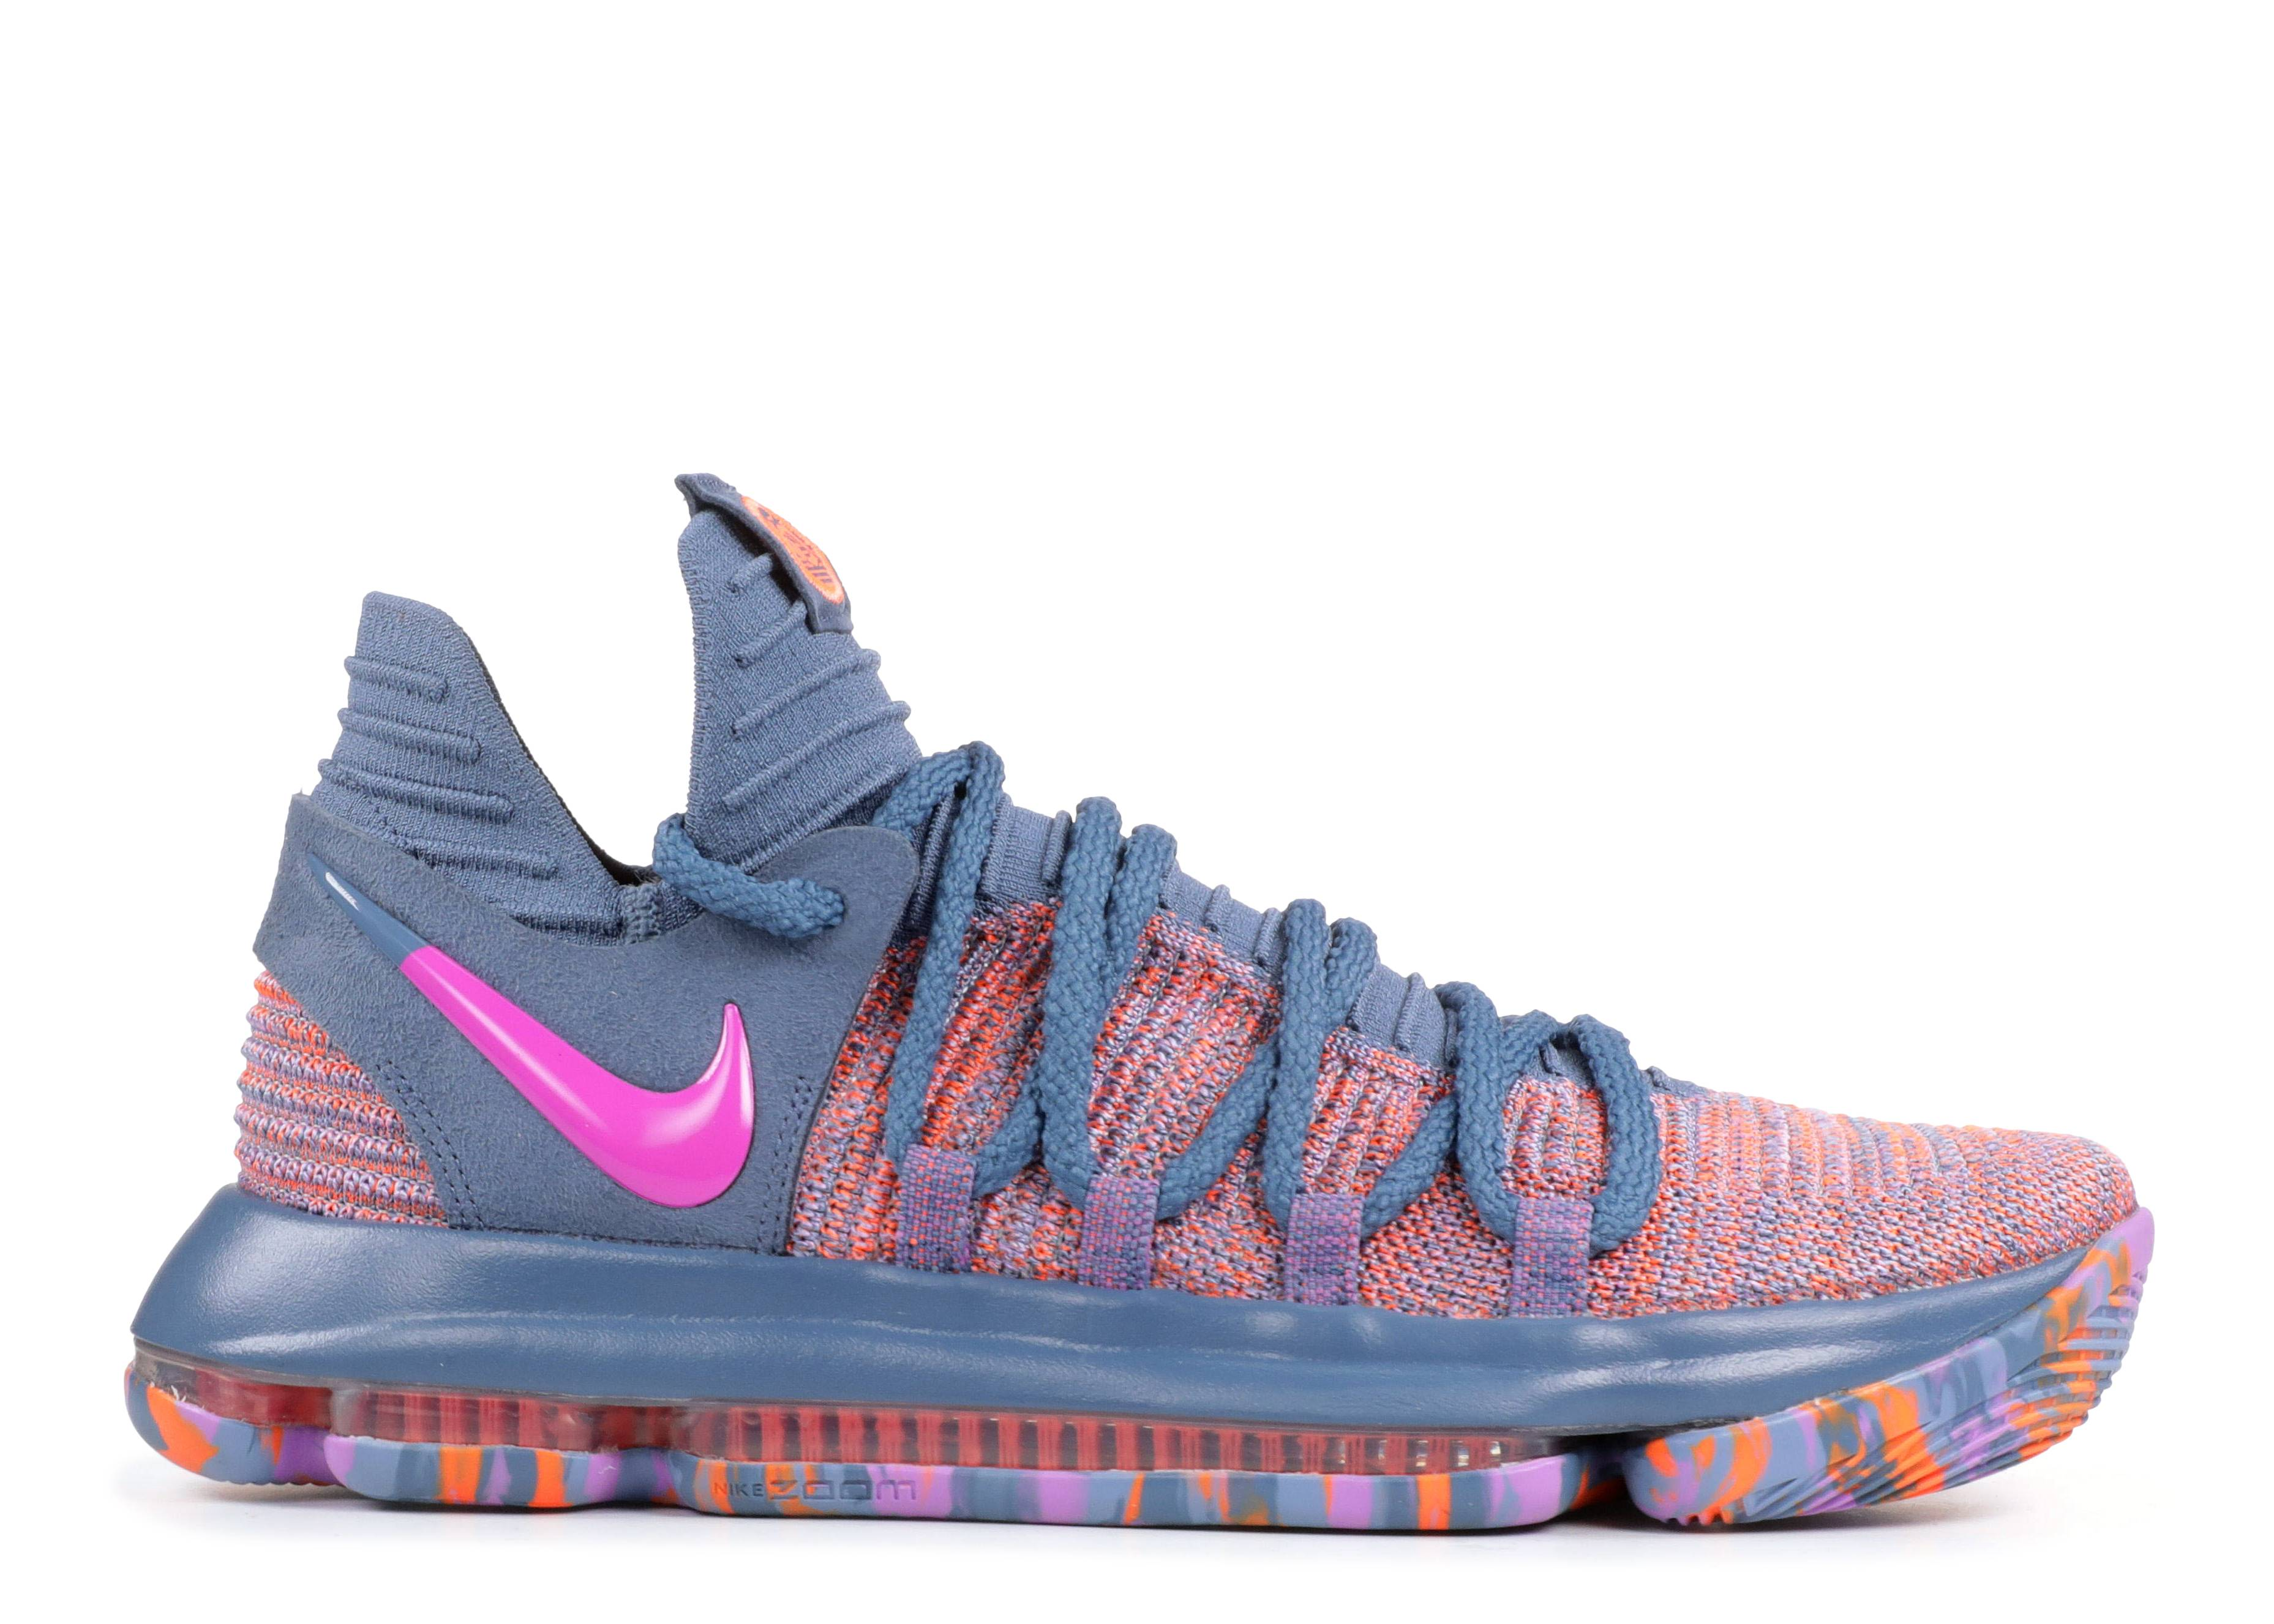 0bd5ef54d8e0 Kevin Durant - Nike Basketball - Nike